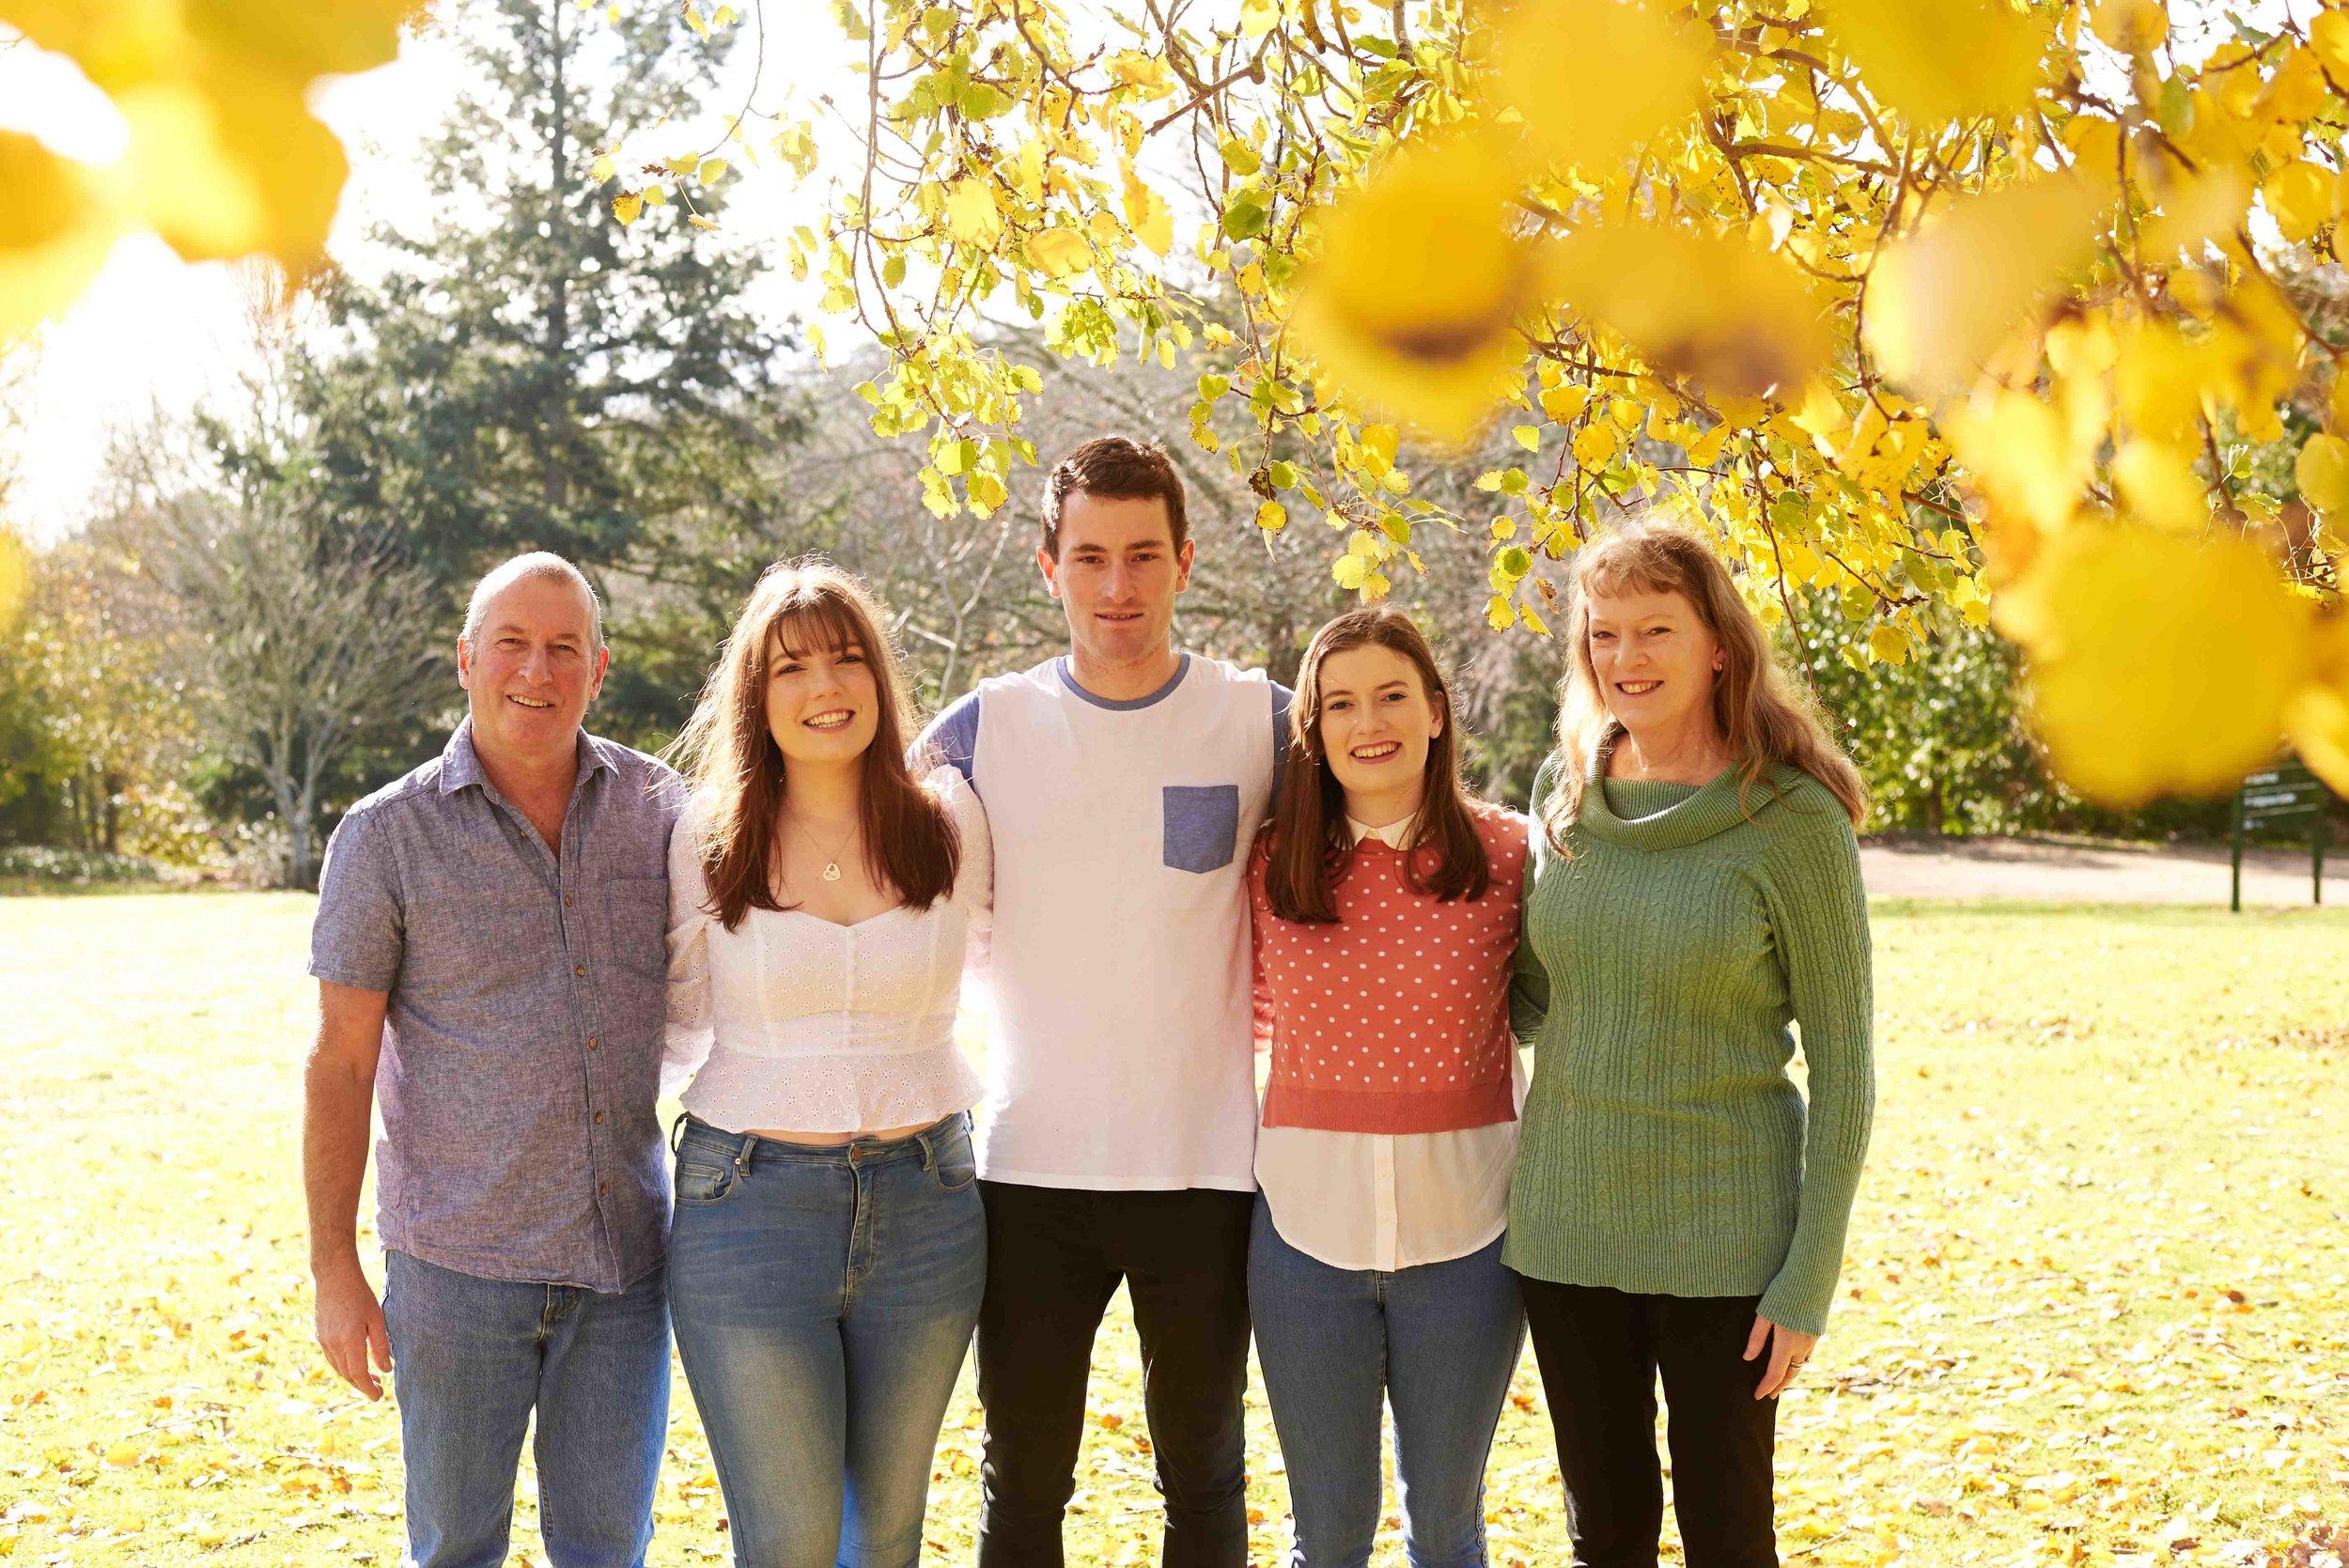 mornington-peninsula-family-photographer-marissa-jade-photography-families-red-hill-20.jpg